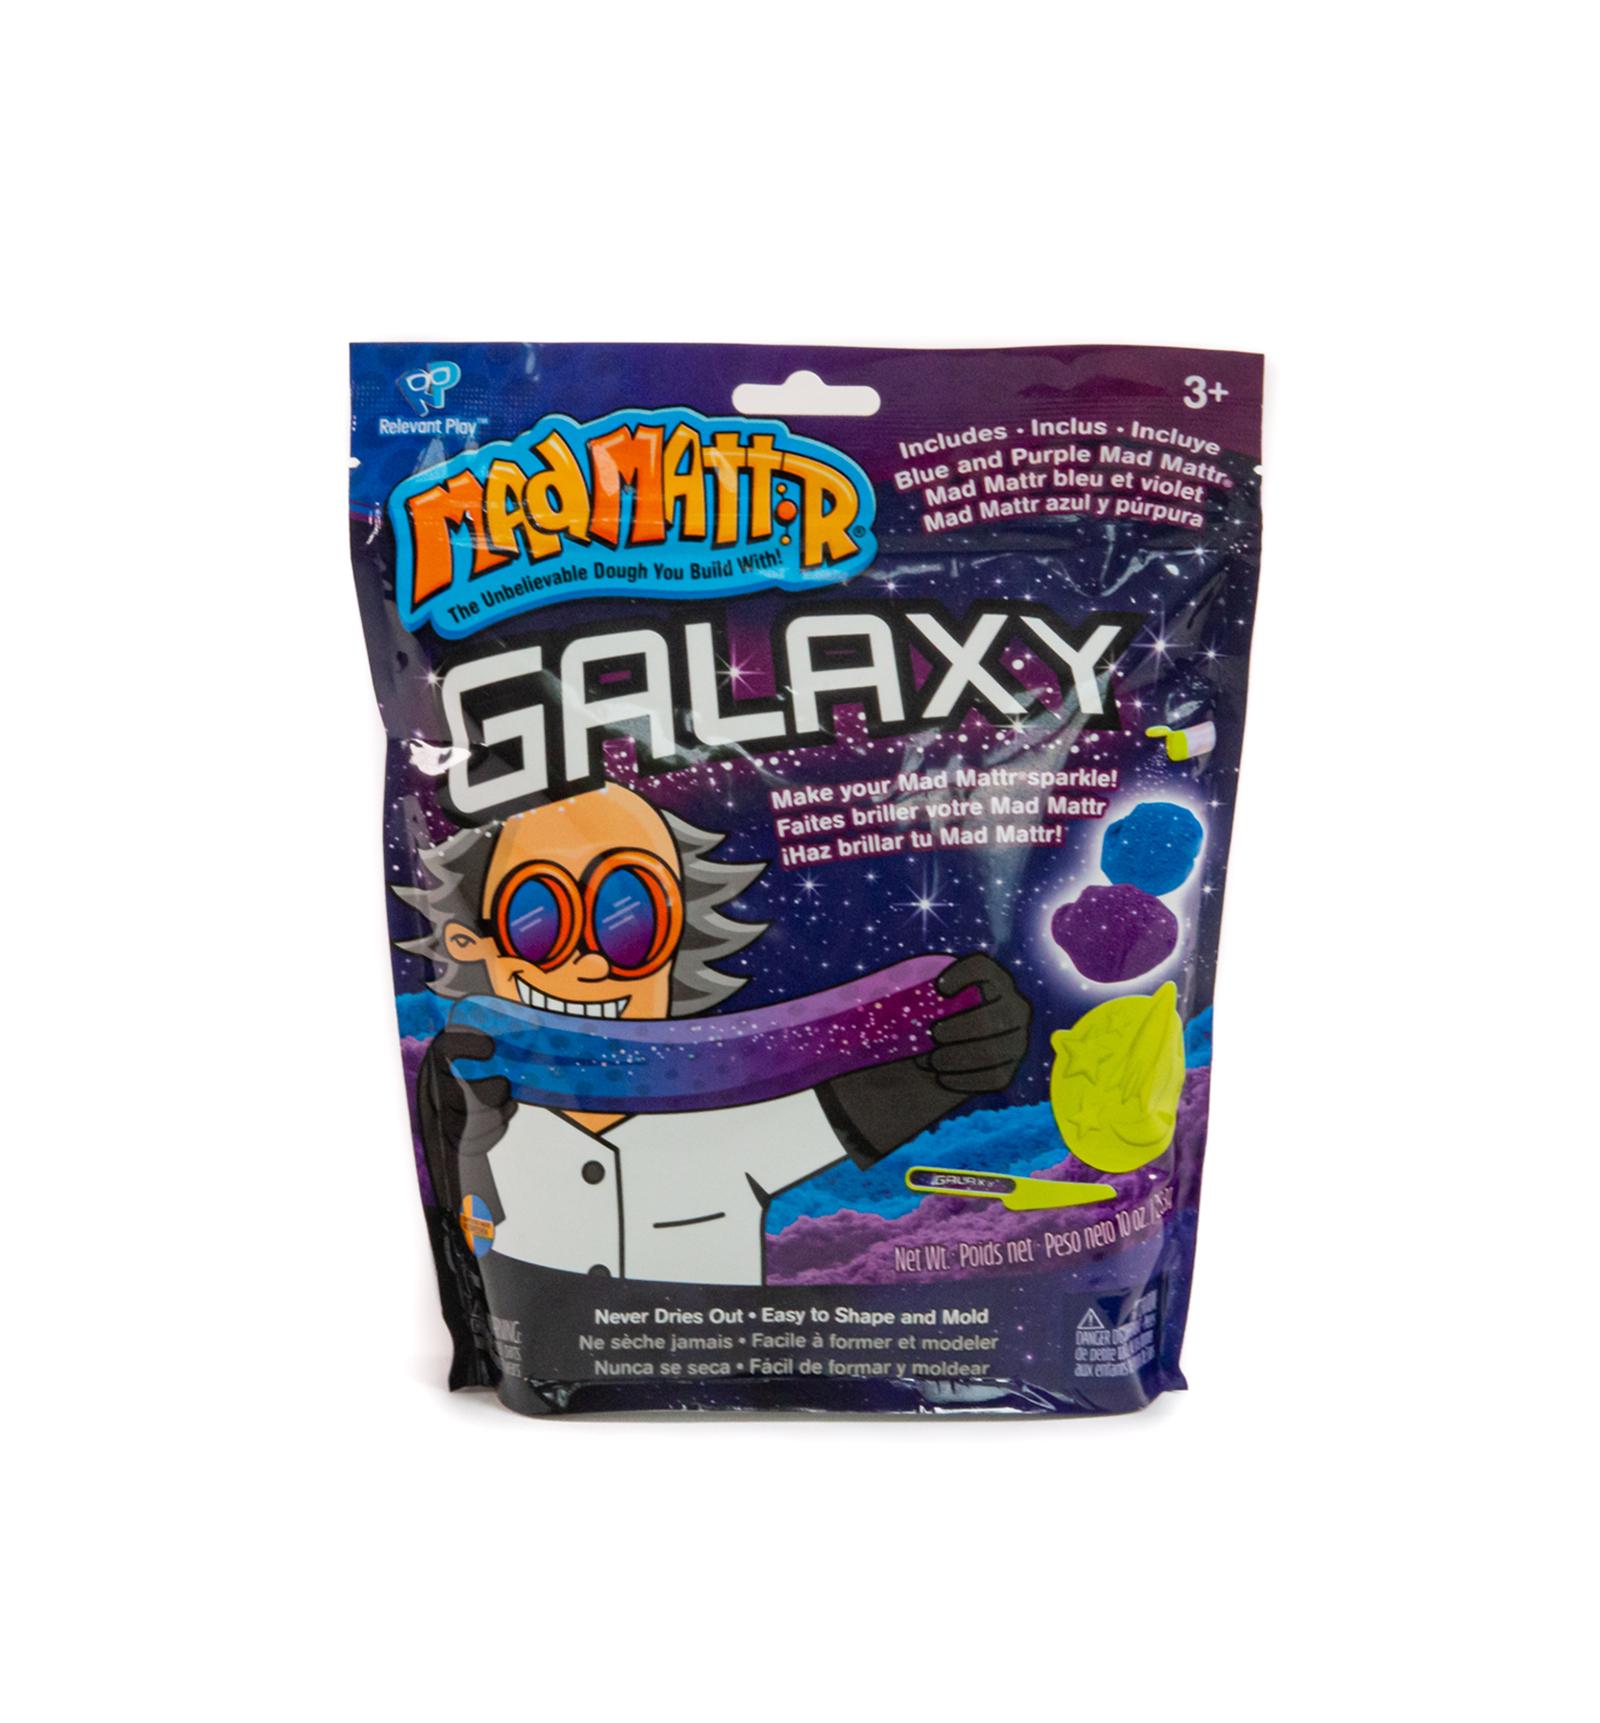 Image 2 Galaxy Mattr 1 - hi-res.jpg